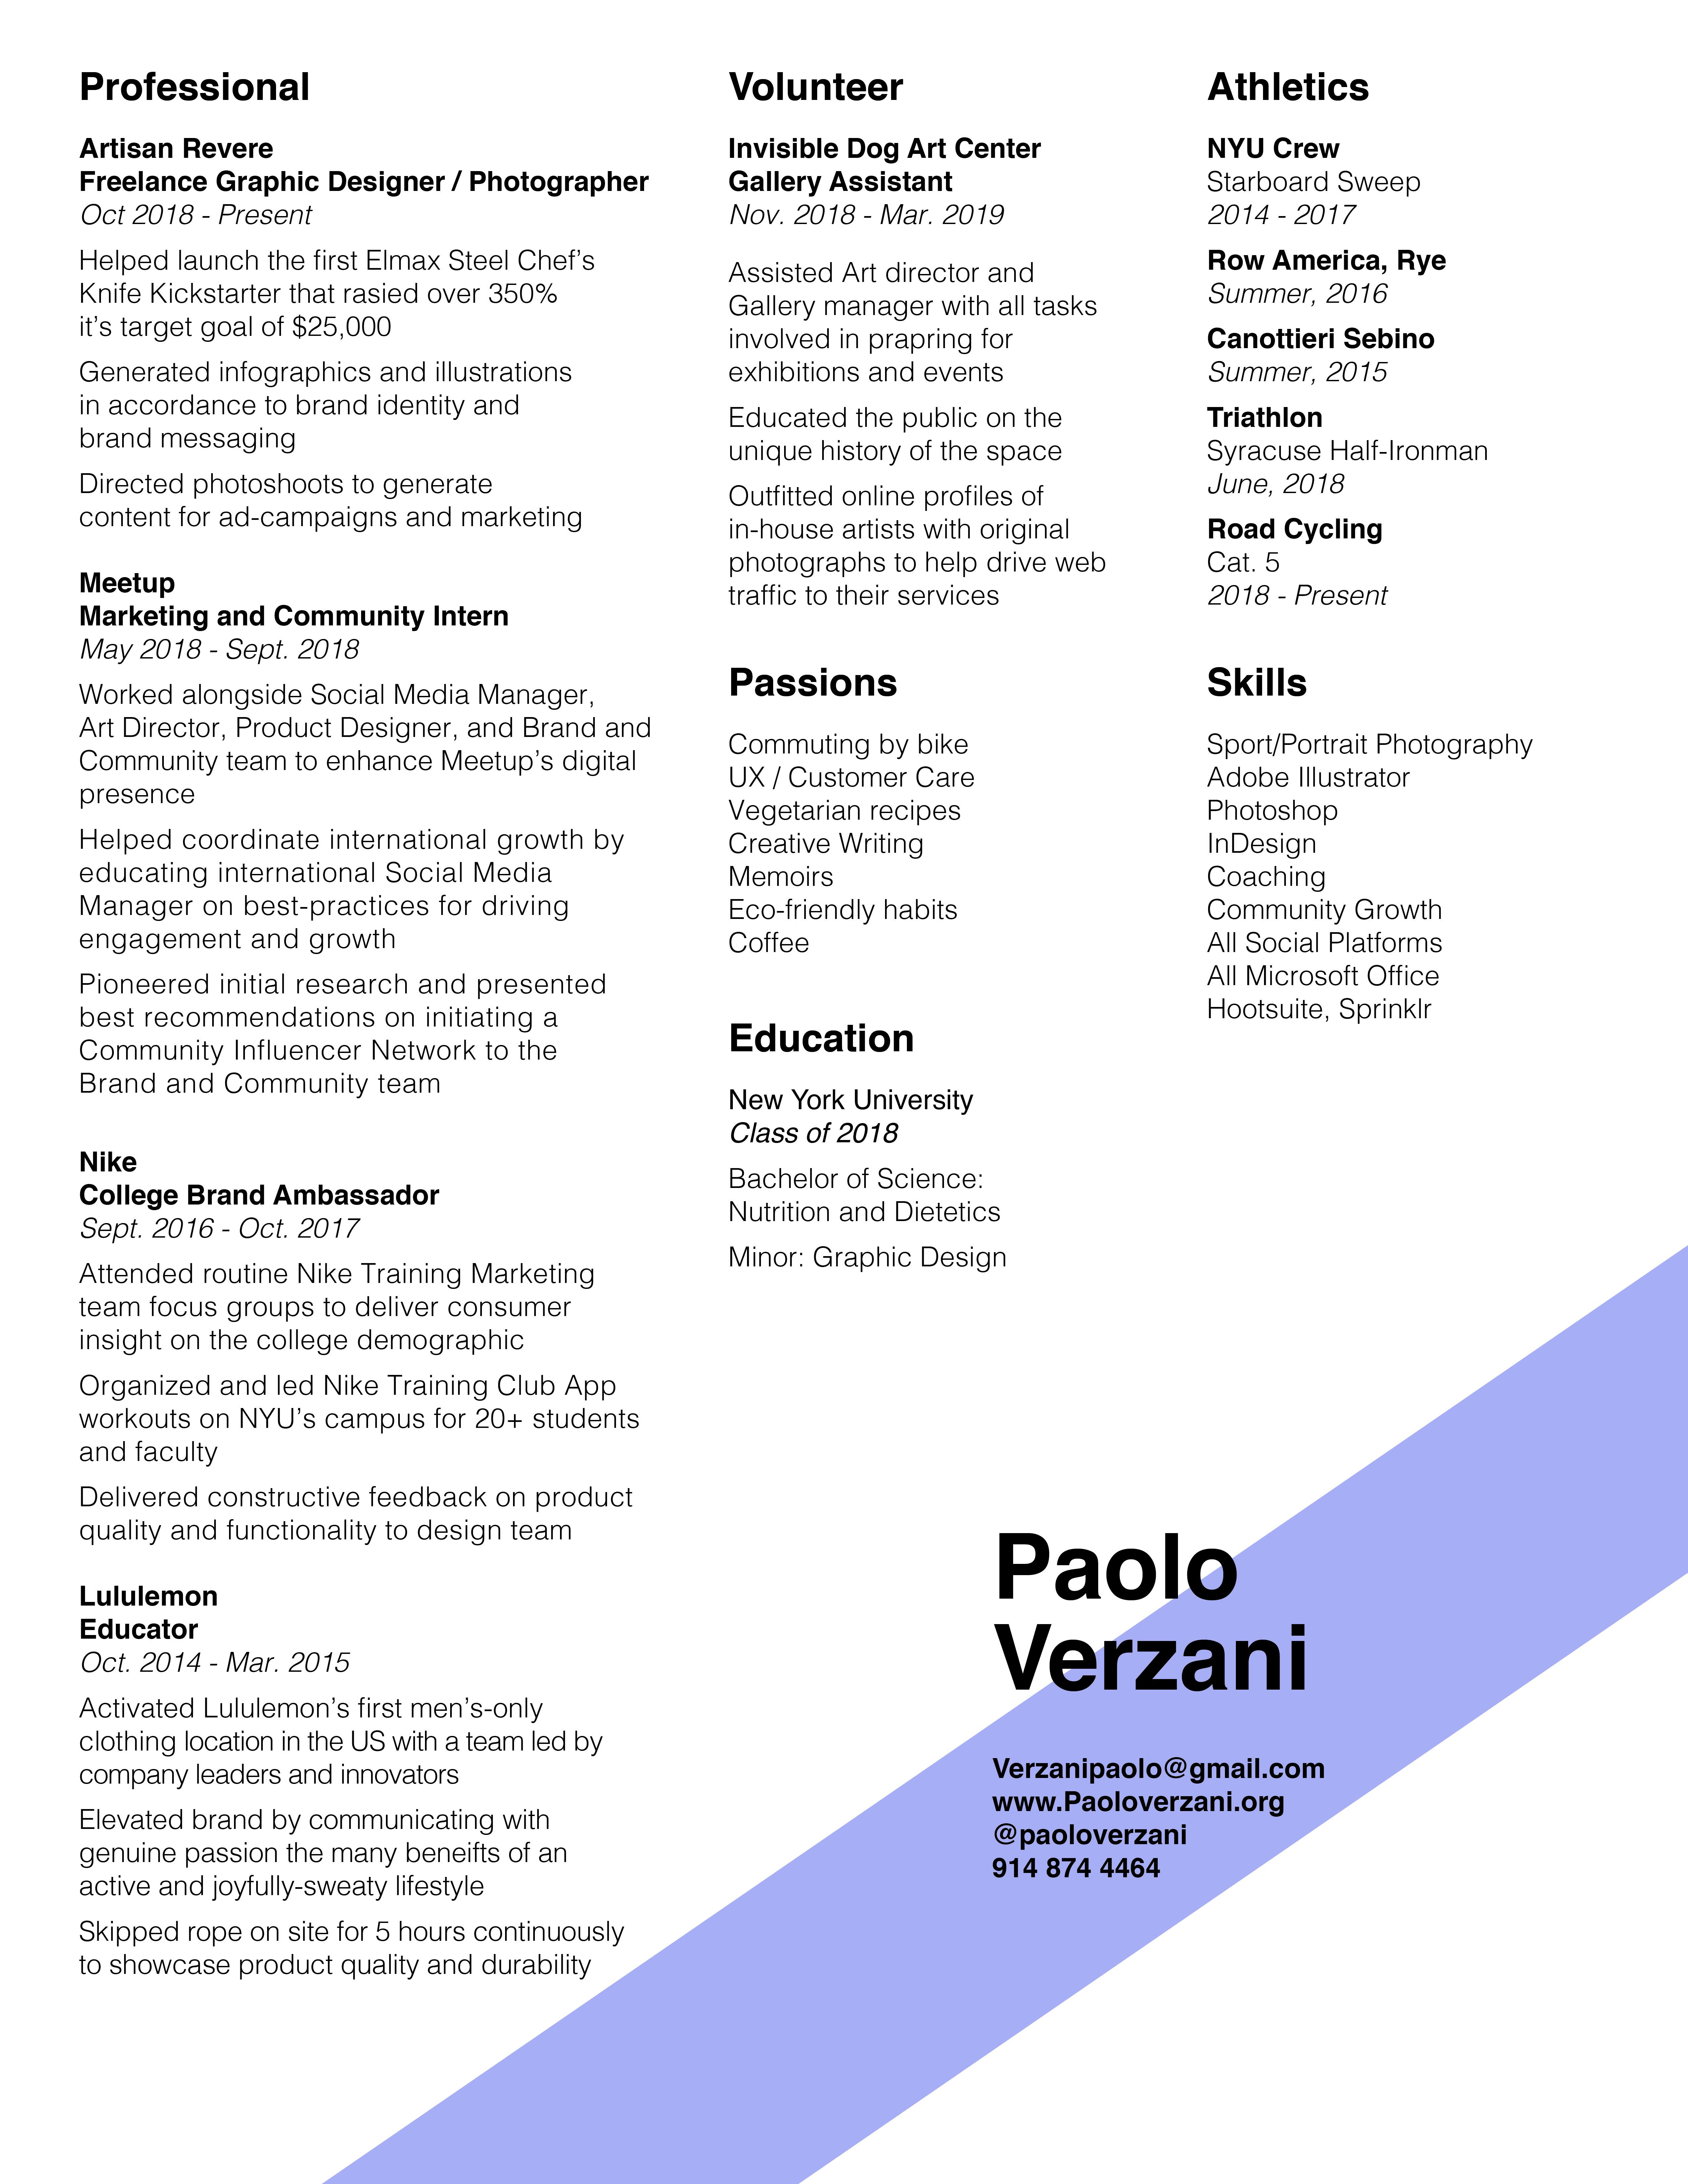 Resume — pv